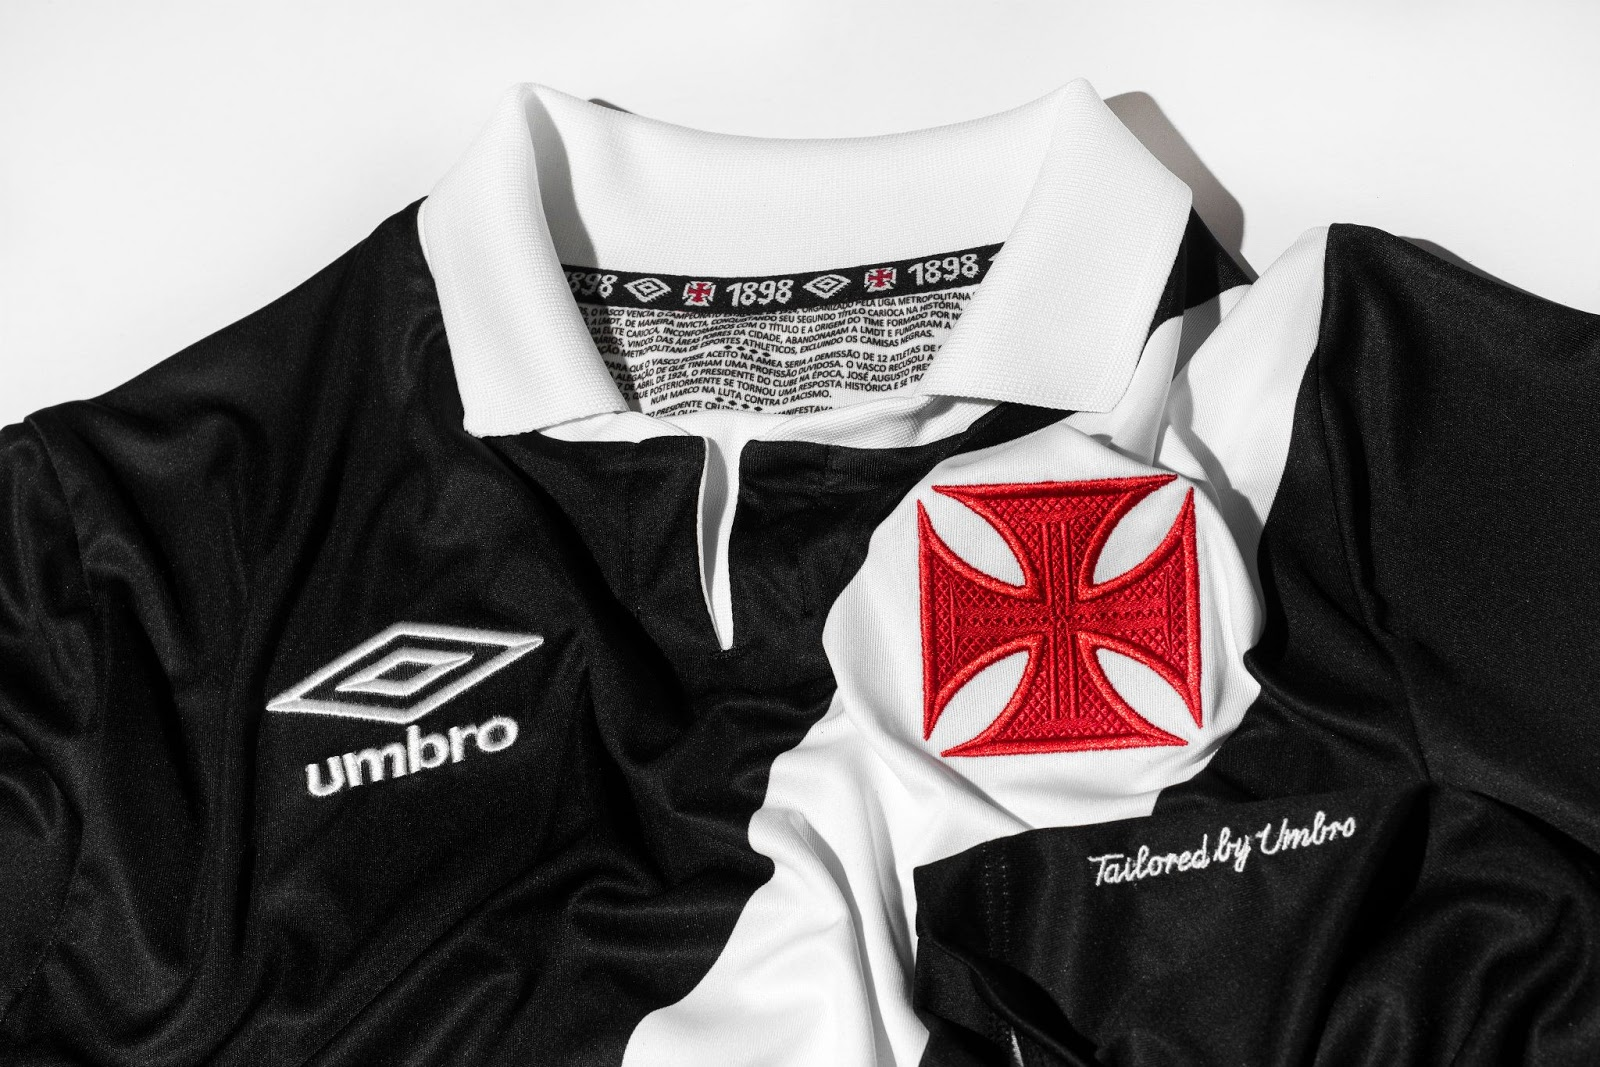 bc489fb2381b4 Black shorts and black socks complete the new all-black Vasco da Gama 14-15  Home Shirt.